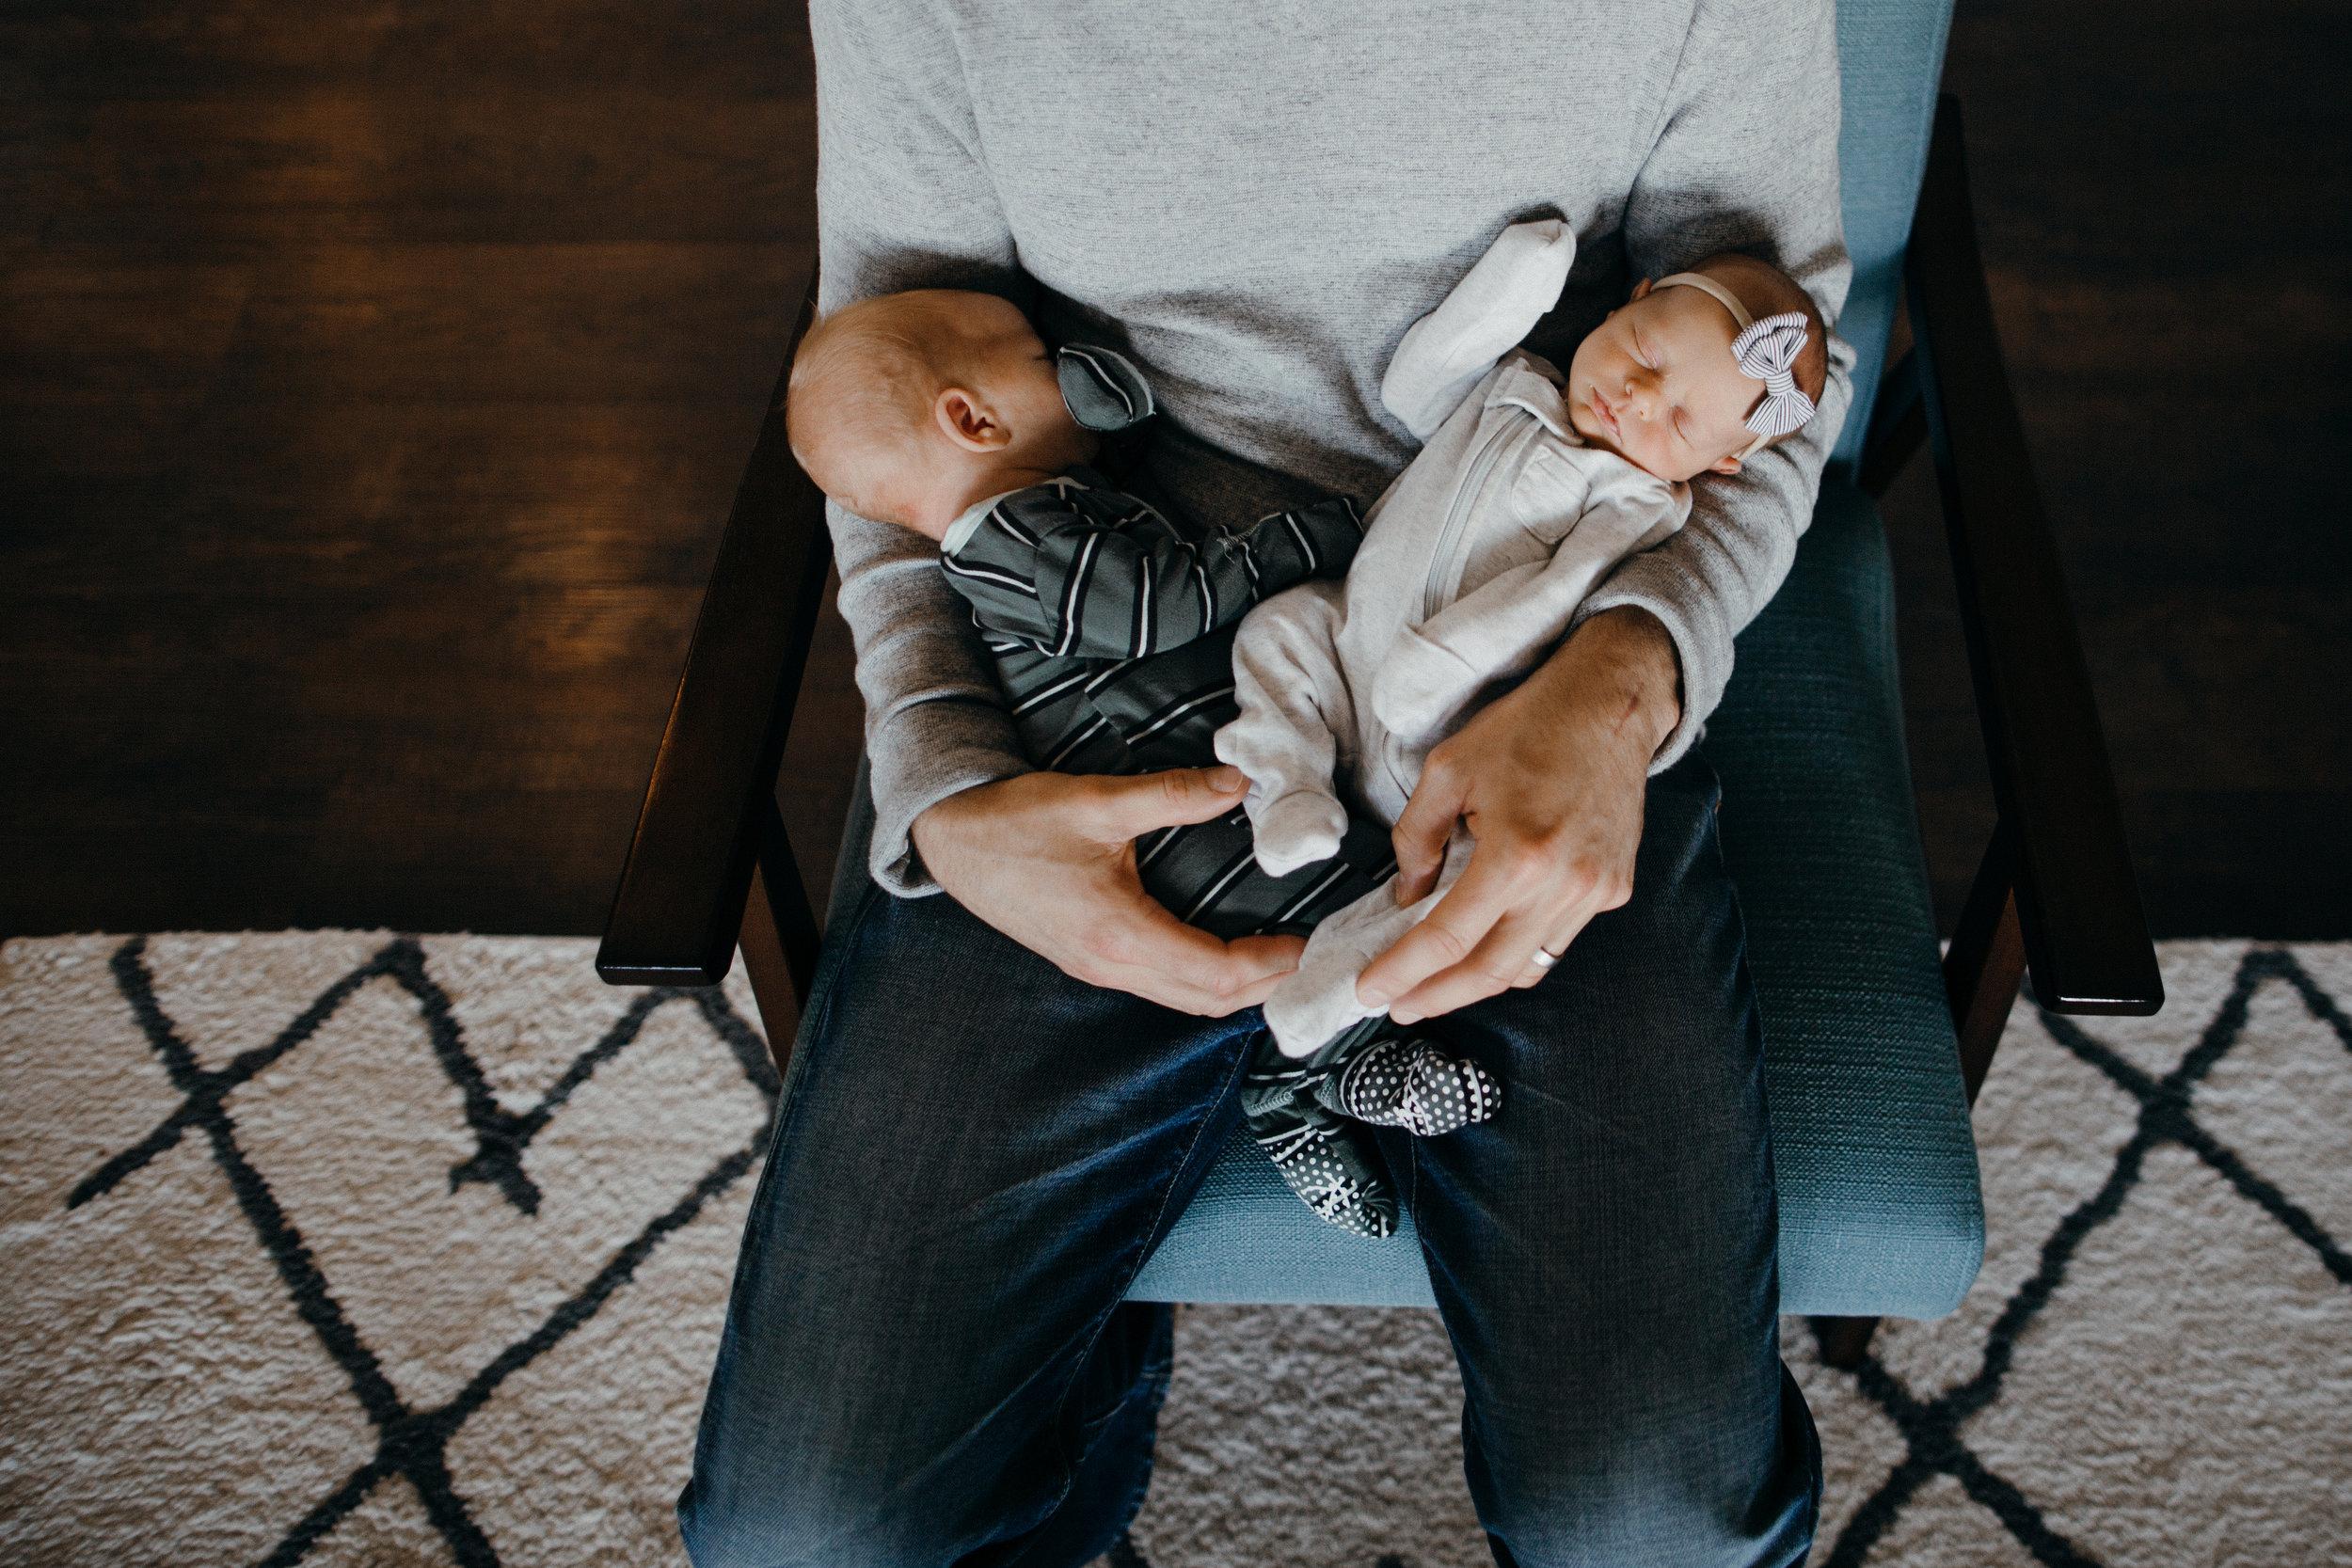 jamieleighmiller_inhome_newborn_photographer_omahanebraska-26.jpg